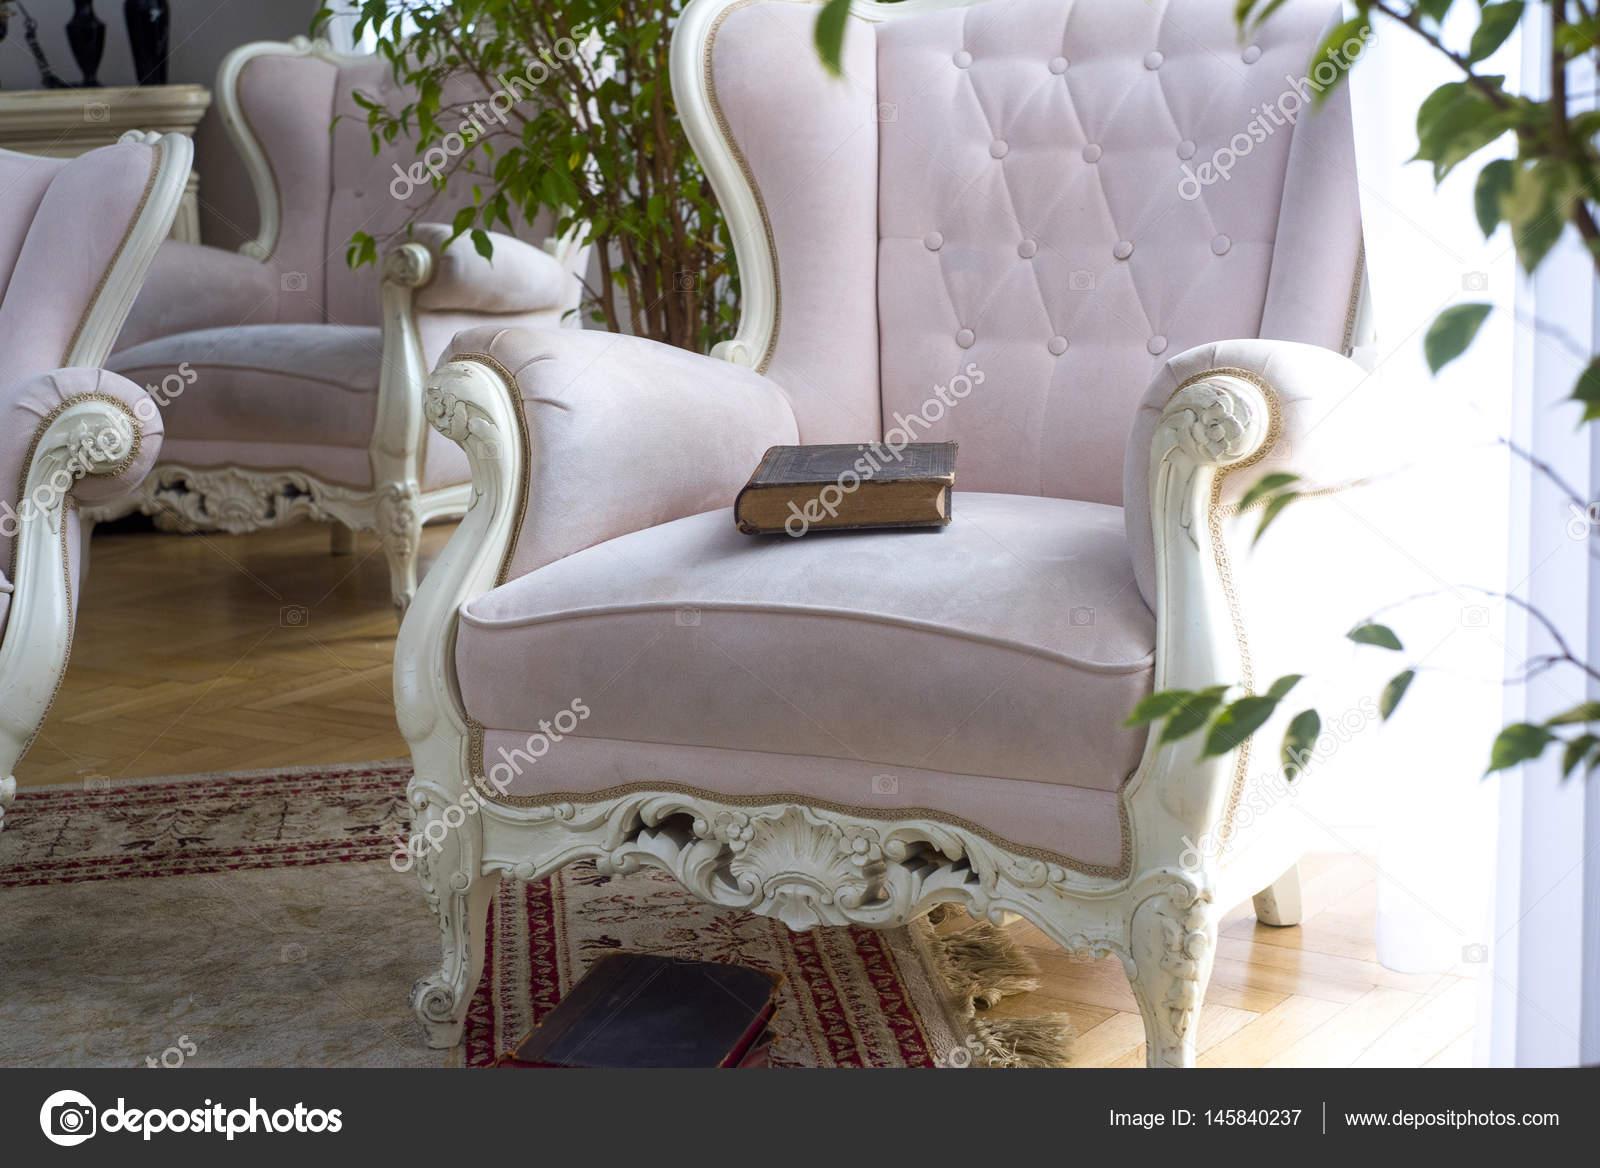 Oud Roze Fauteuil : Oud boek liggend op de fauteuil u stockfoto stockcrafter